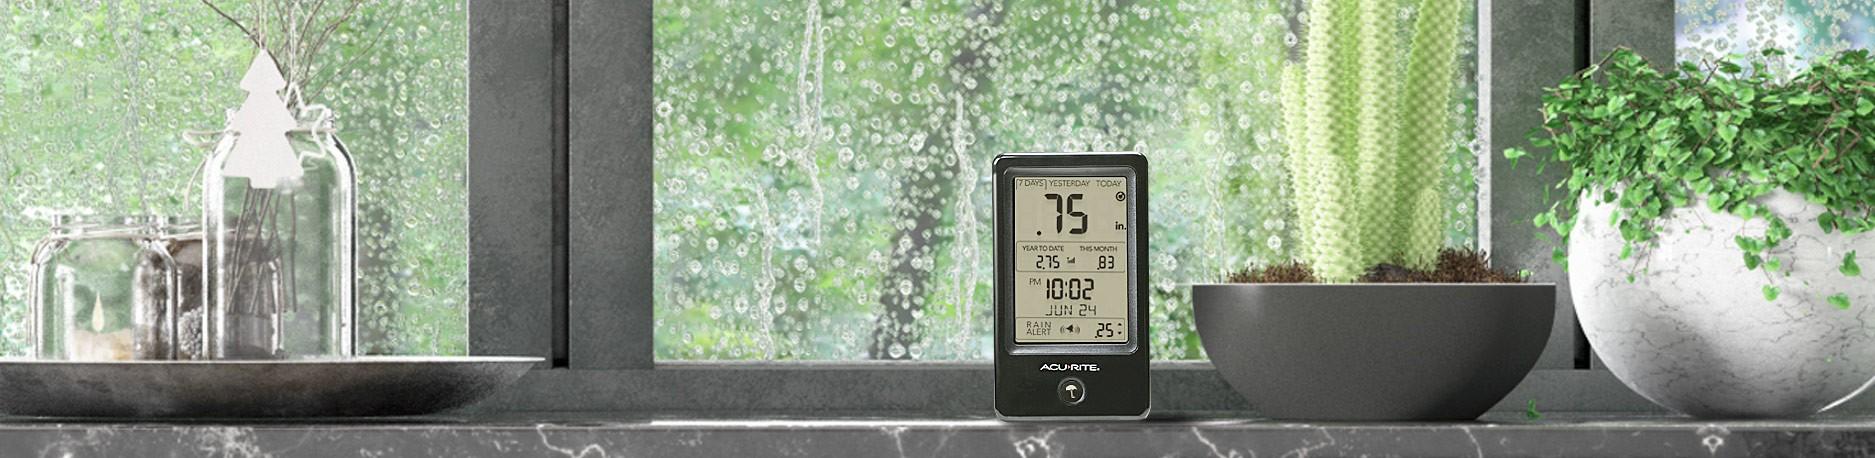 Launching Digital Rain Gauge with New Display!